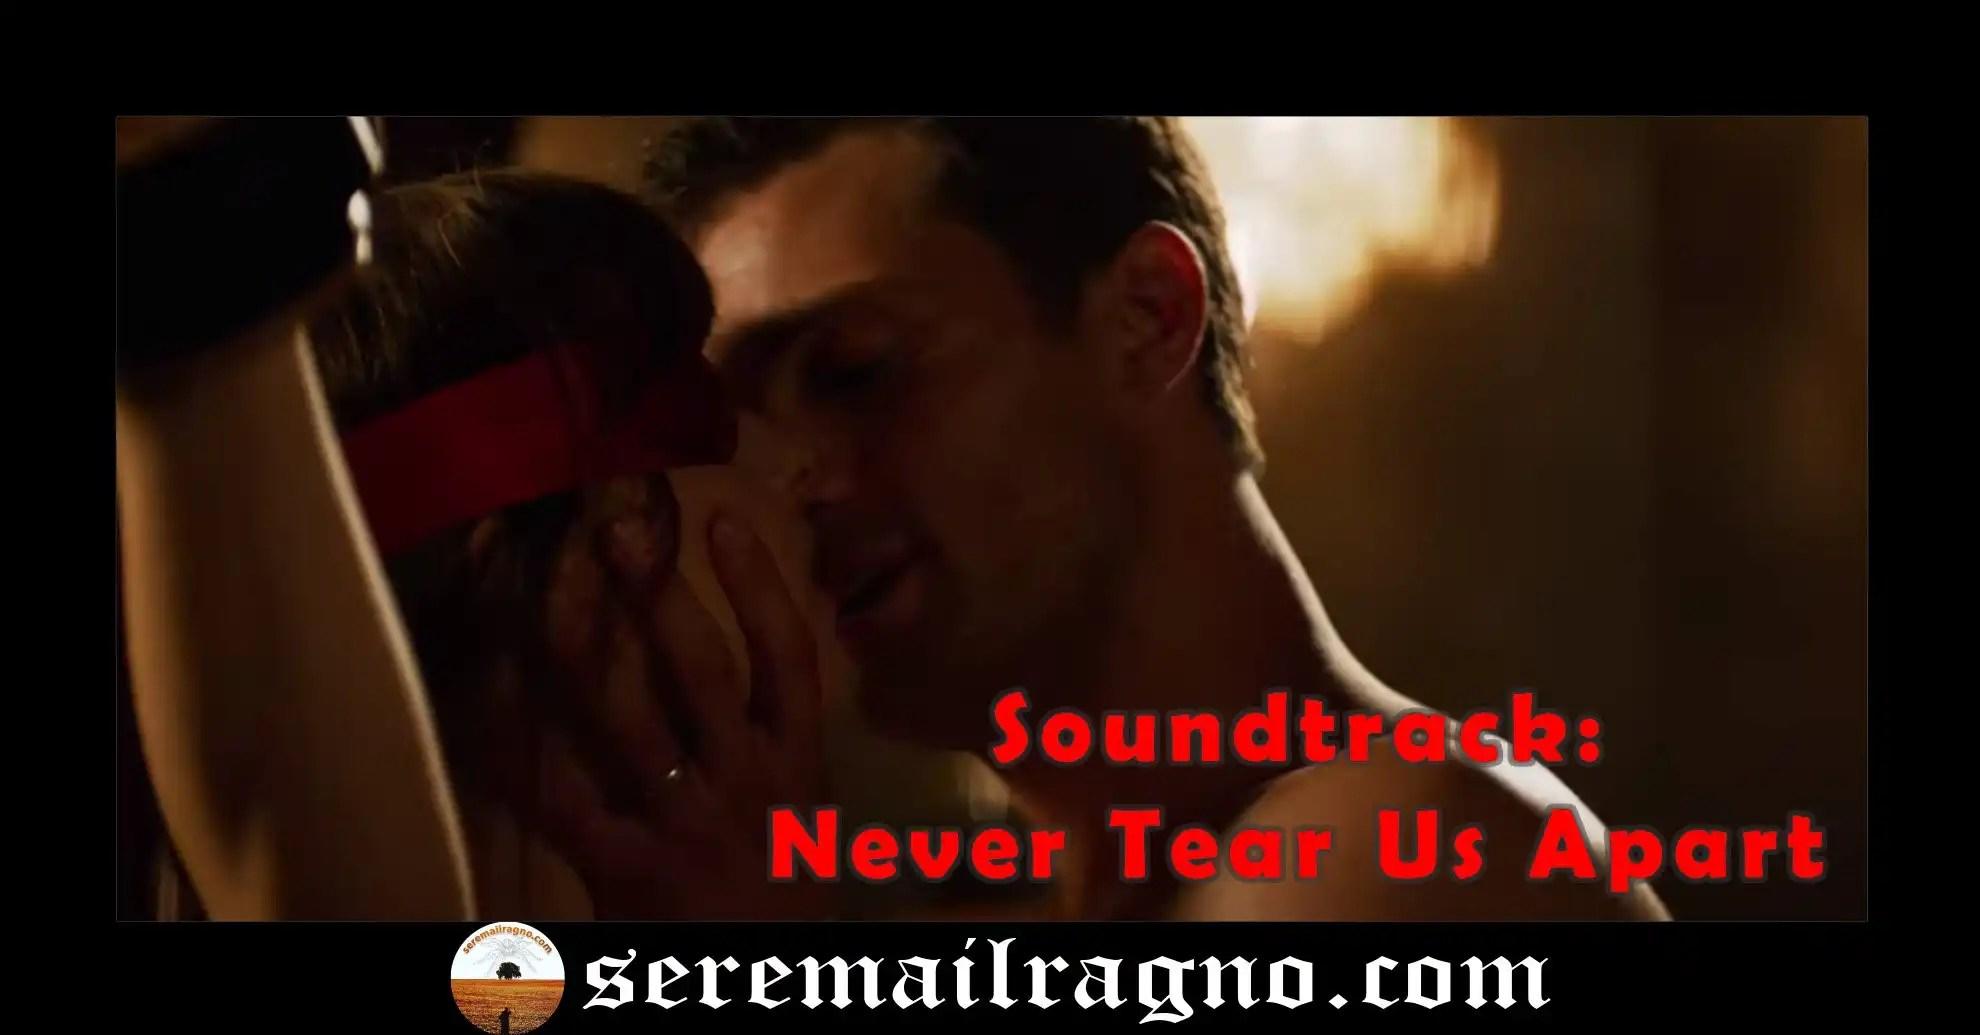 Soundtrack 50 sfumature di rosso: Never Tear Us Apart